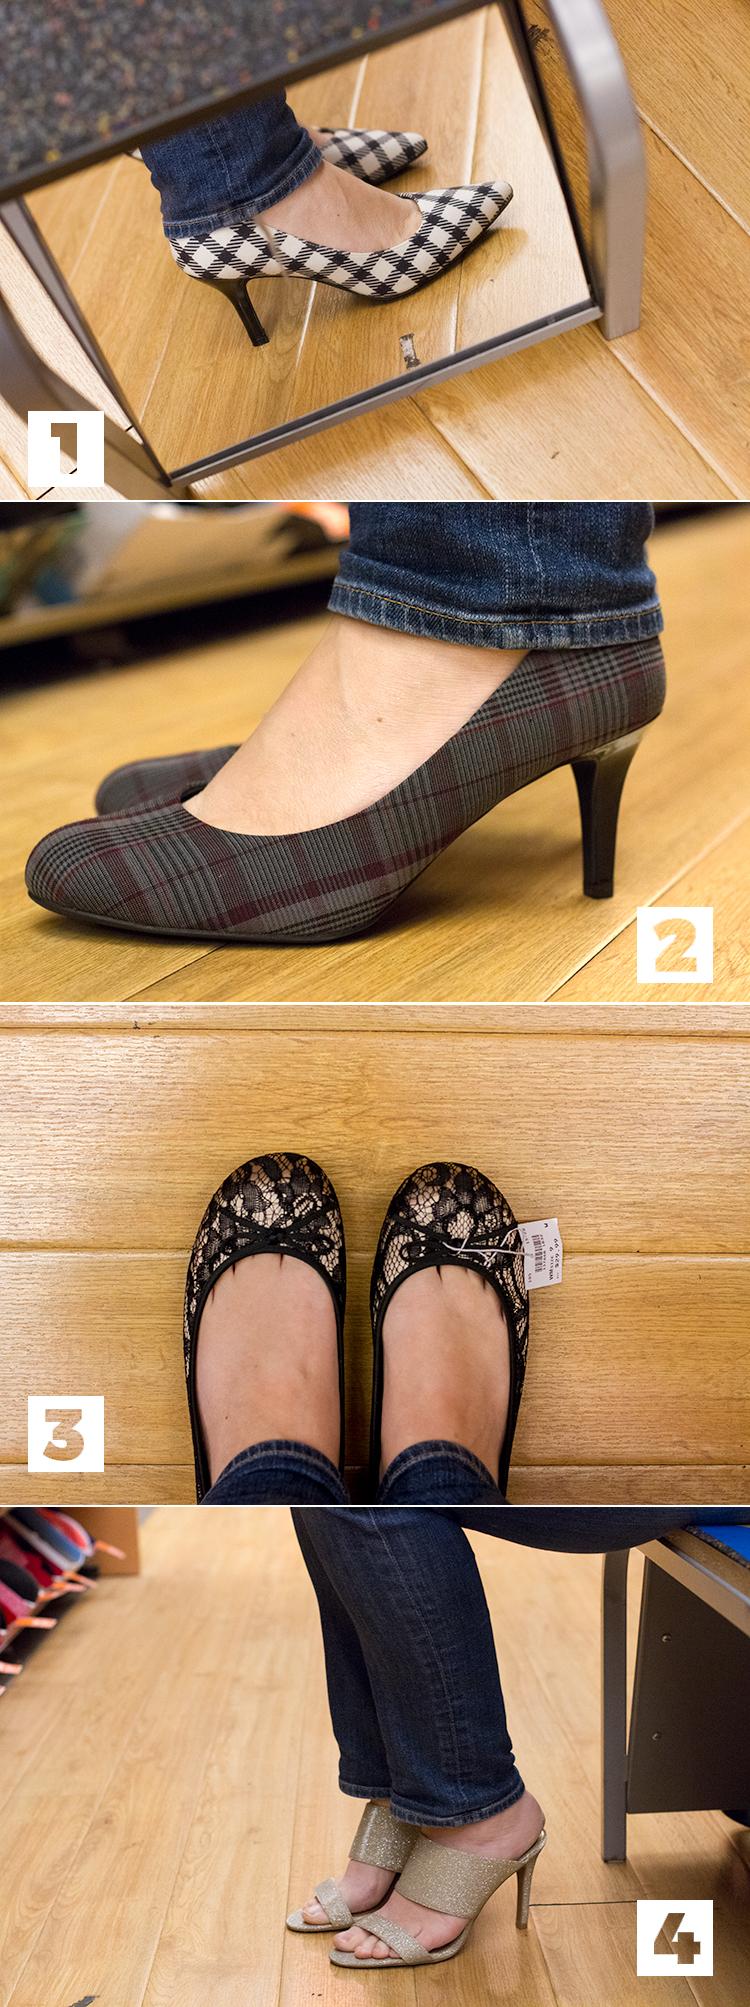 5 cute shoes!